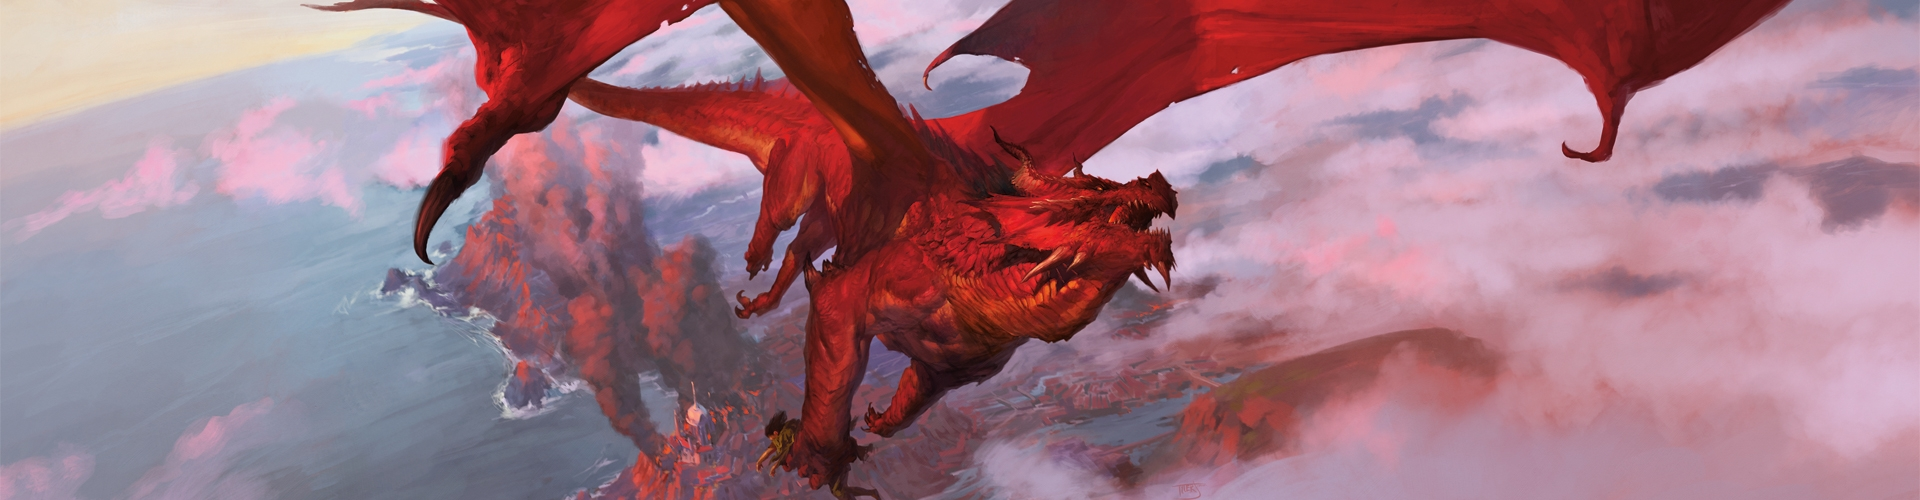 Tyranny of Dragons: Online Comic #6